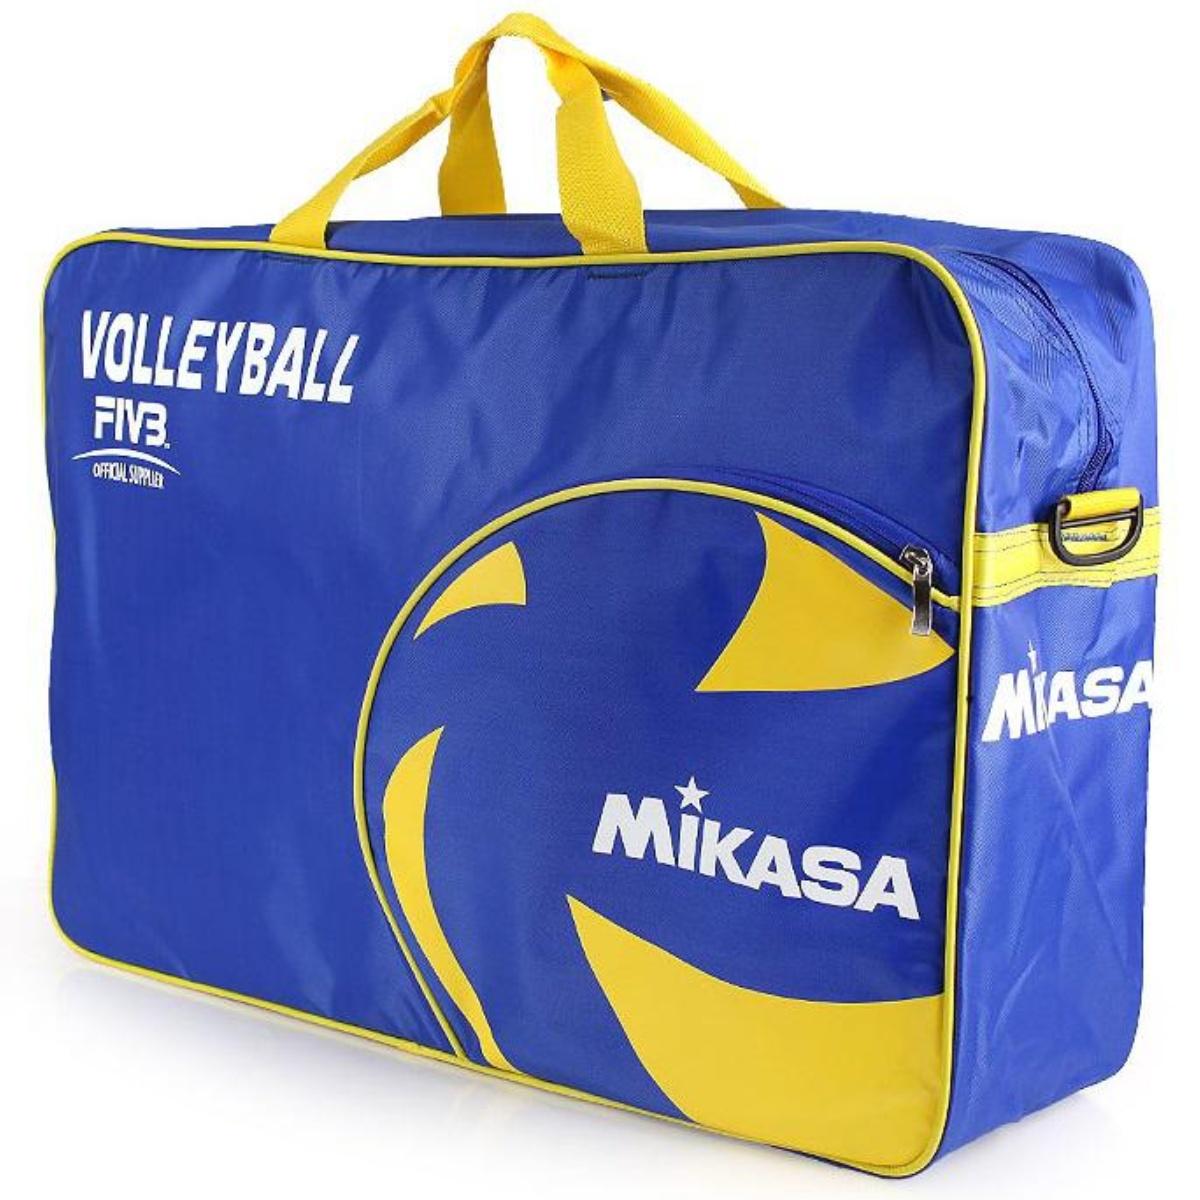 Športová taška MIKASA na 6 lôpt